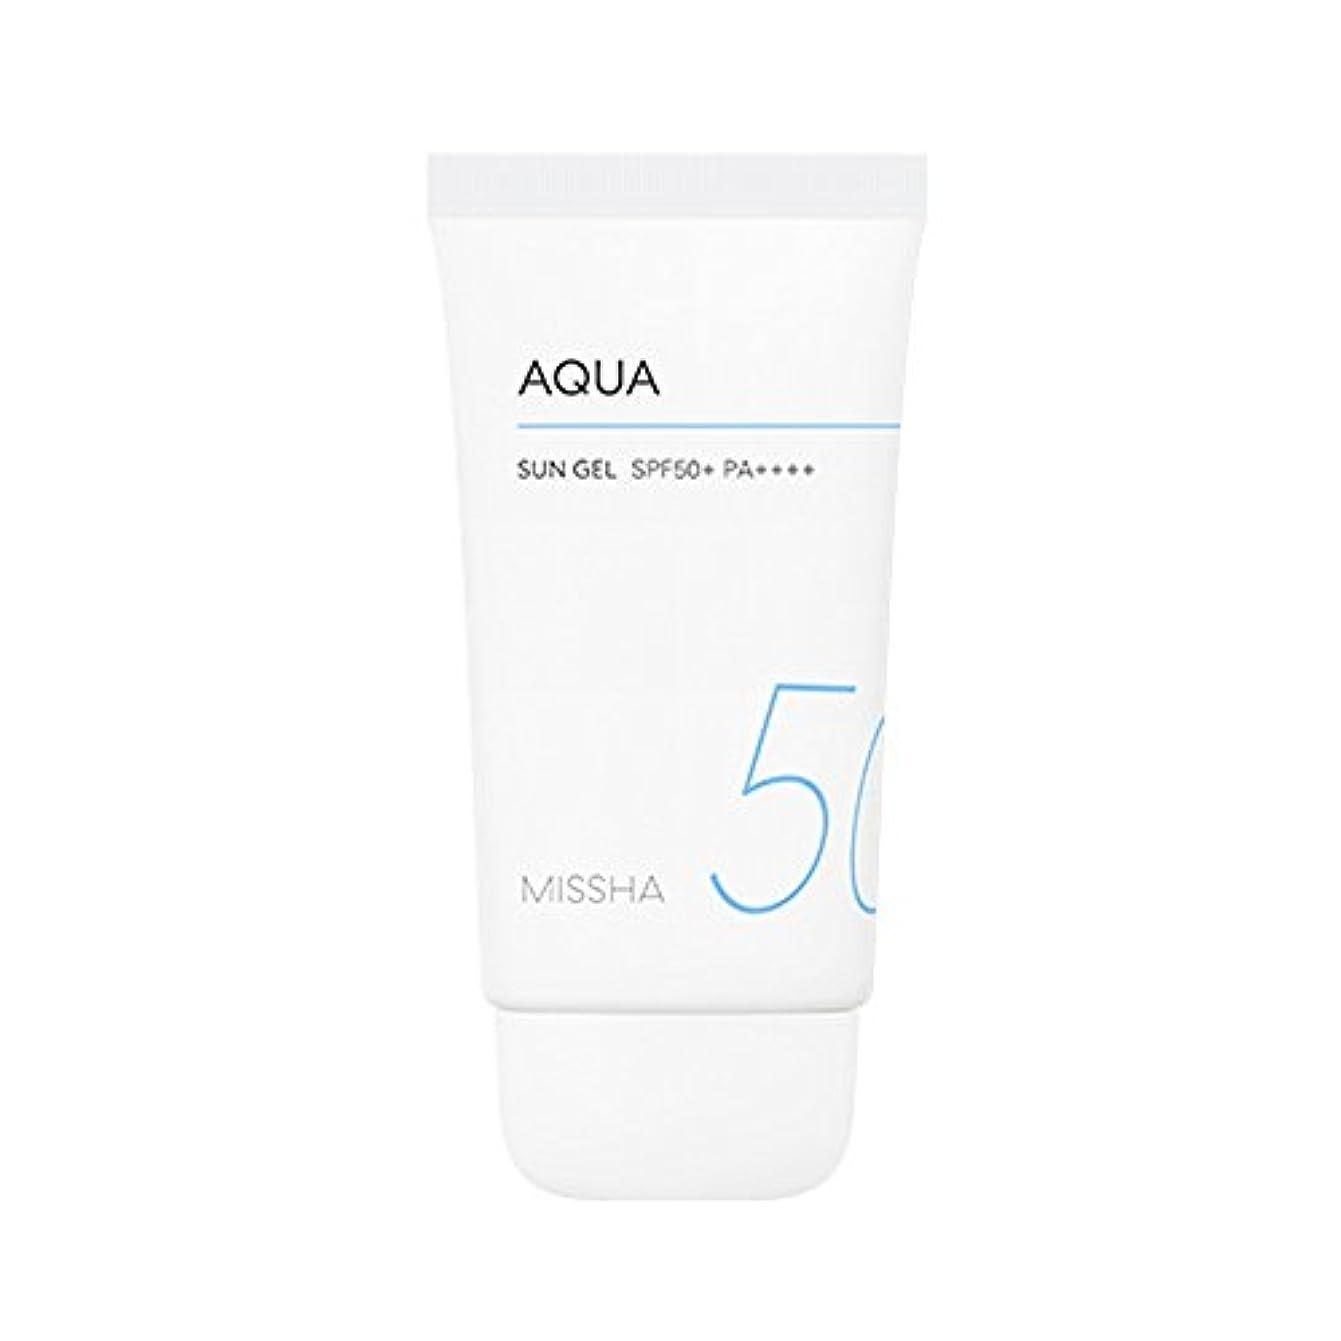 Missha All Around Safe Block Aqua Sun Gel SPF50+ PA++++ 50ml ミシャ オール アラウンド セーフ ブロック アクア サン ジェル 50ml [並行輸入品]